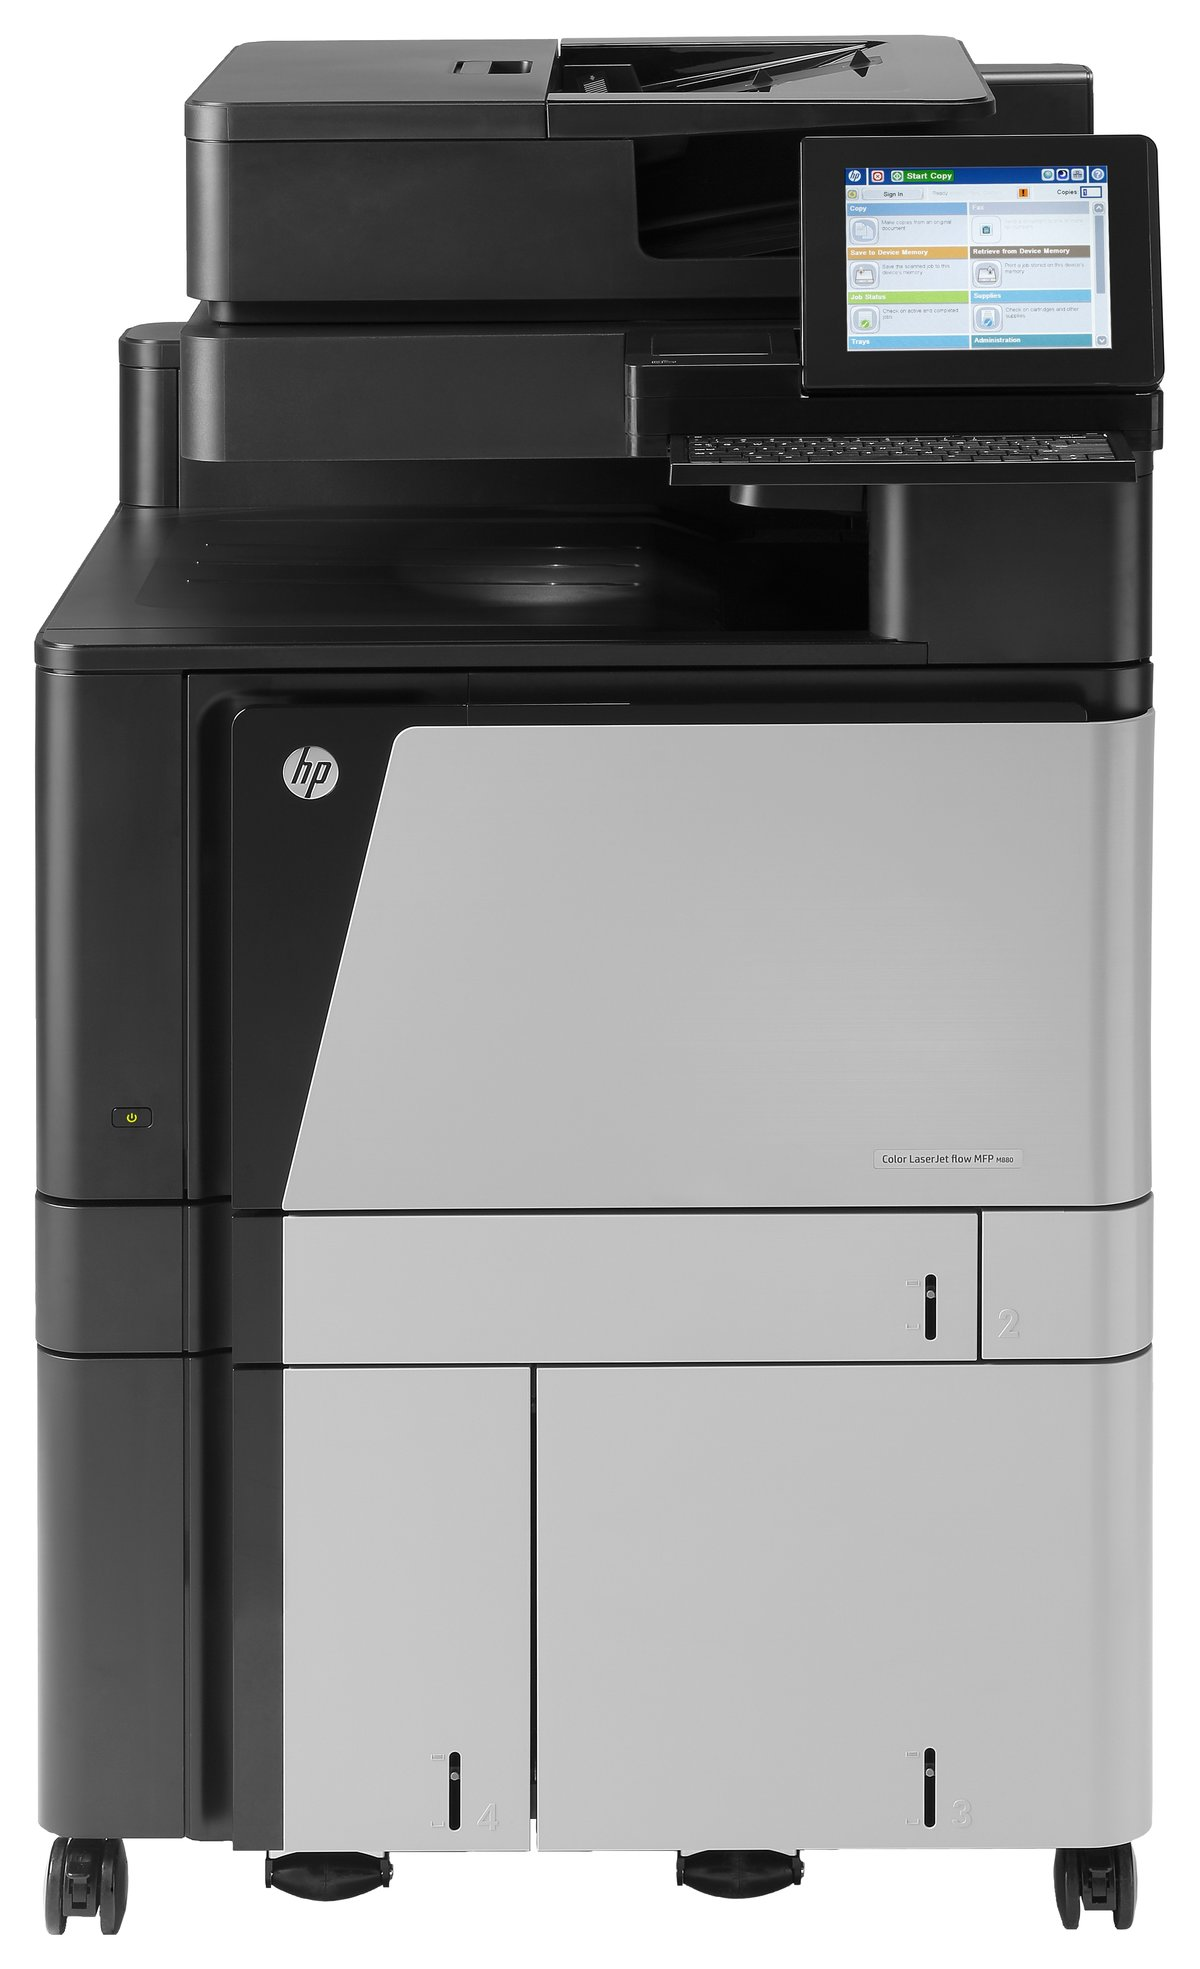 A2W76A B19 HP LaserJet Enterprise Flow MFP M880z multifunction printer colour Currys PC World Business